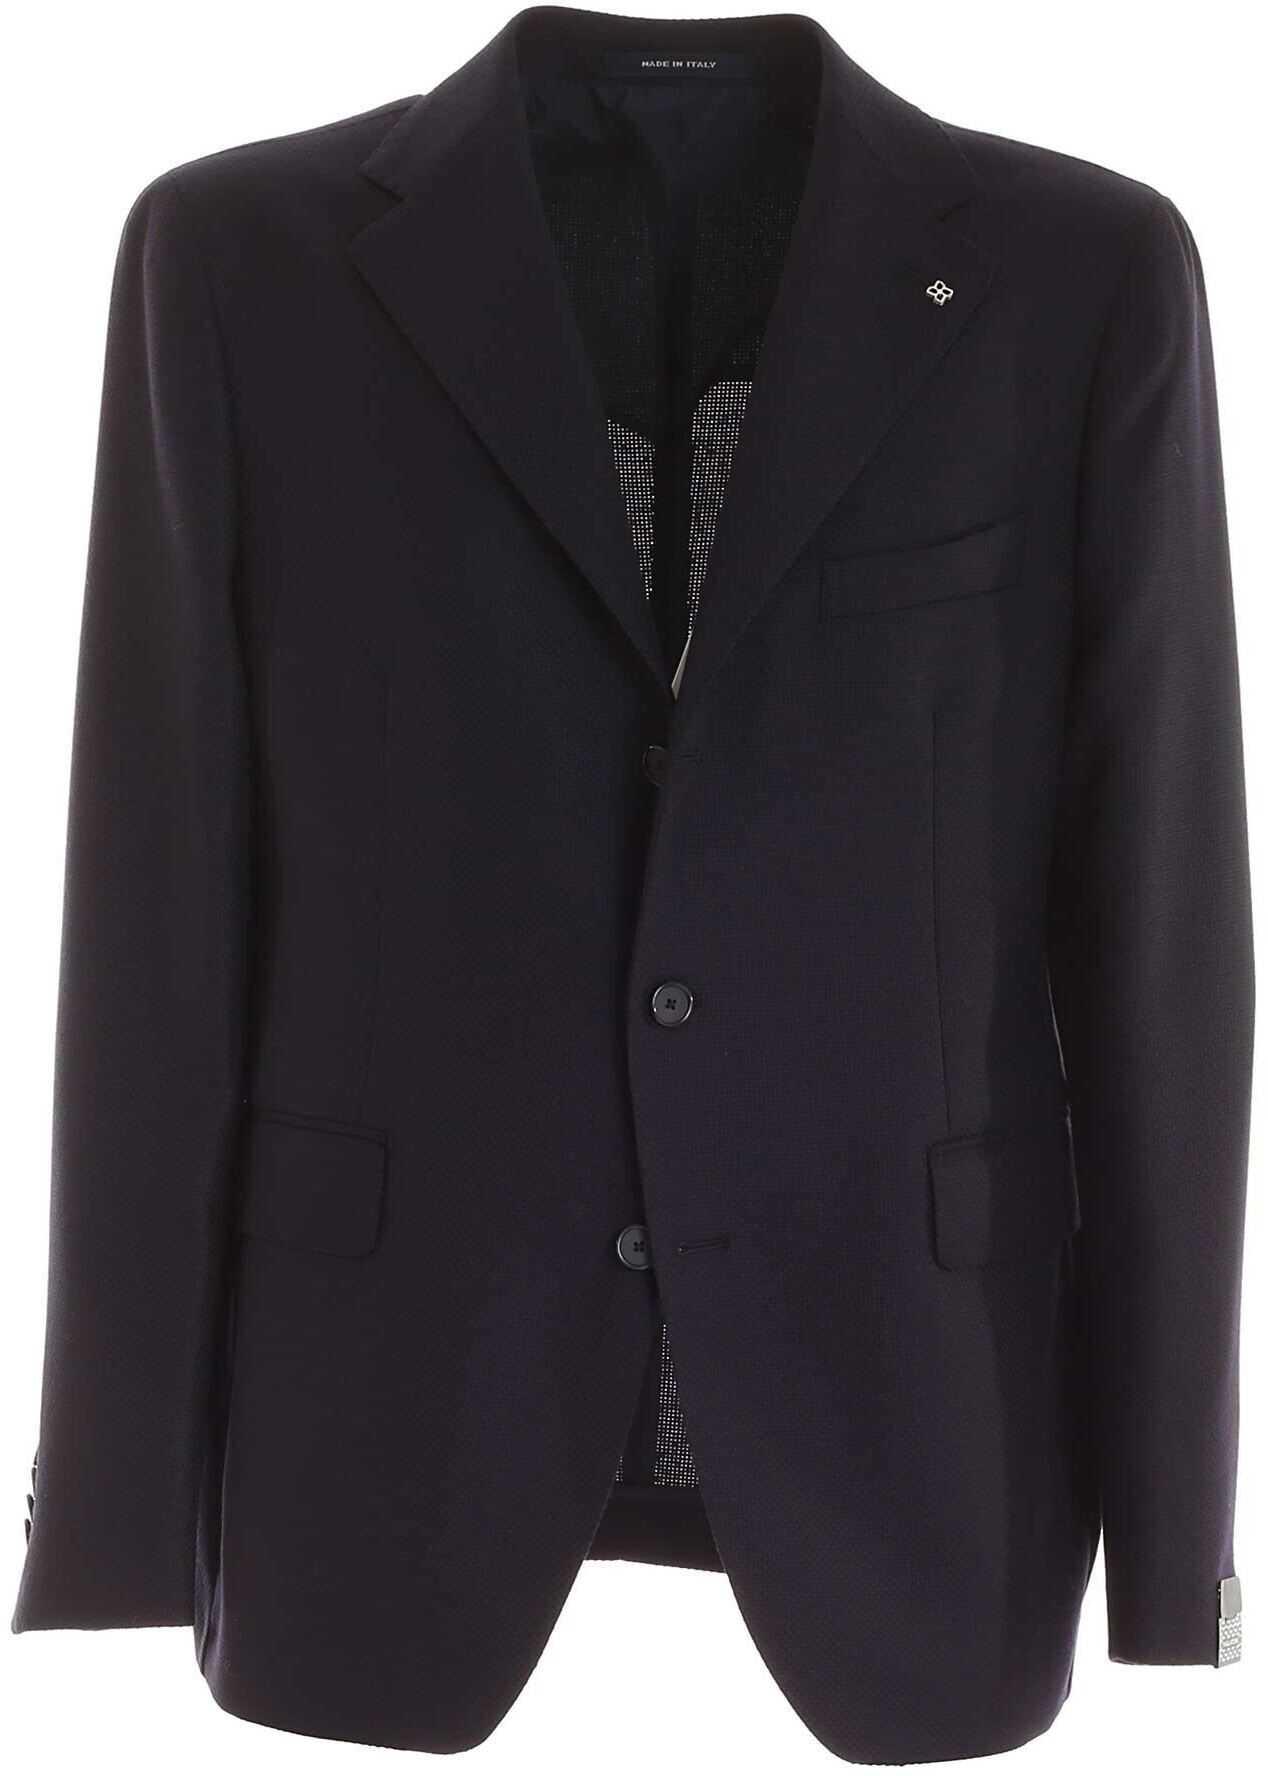 Tagliatore Single-Breasted Jacket In Blue Blue imagine